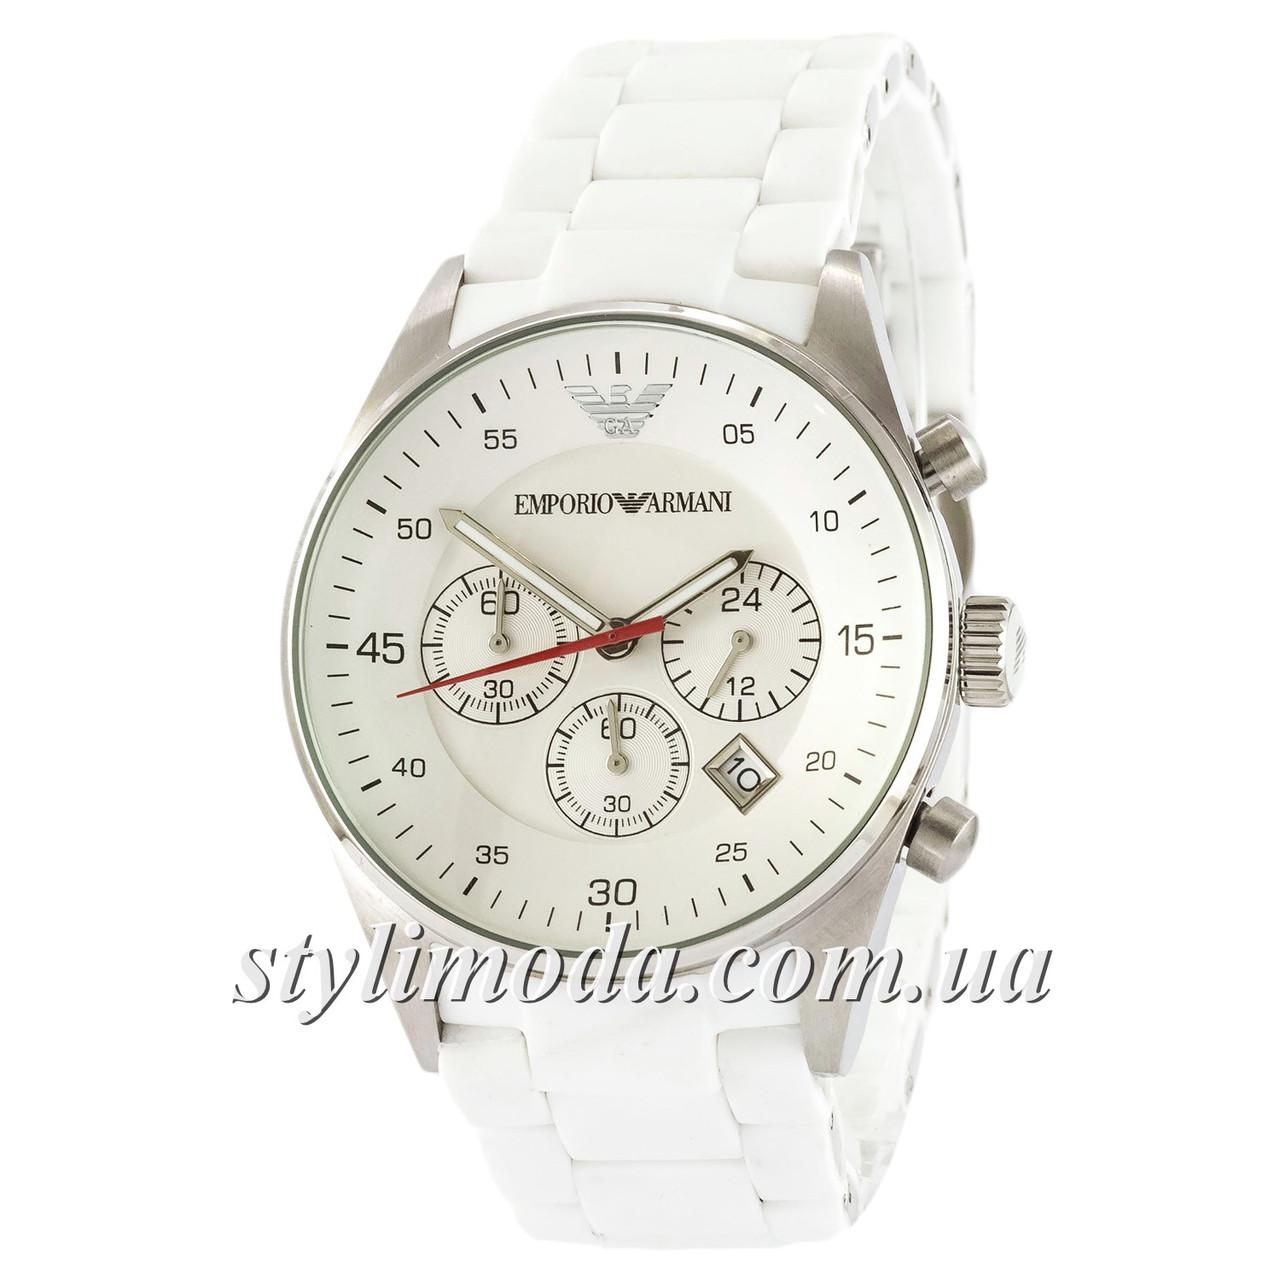 Часы Наручные Emporio Armani AAA White-Silver Silicone (реплика) — в ... 0982aa6f36b